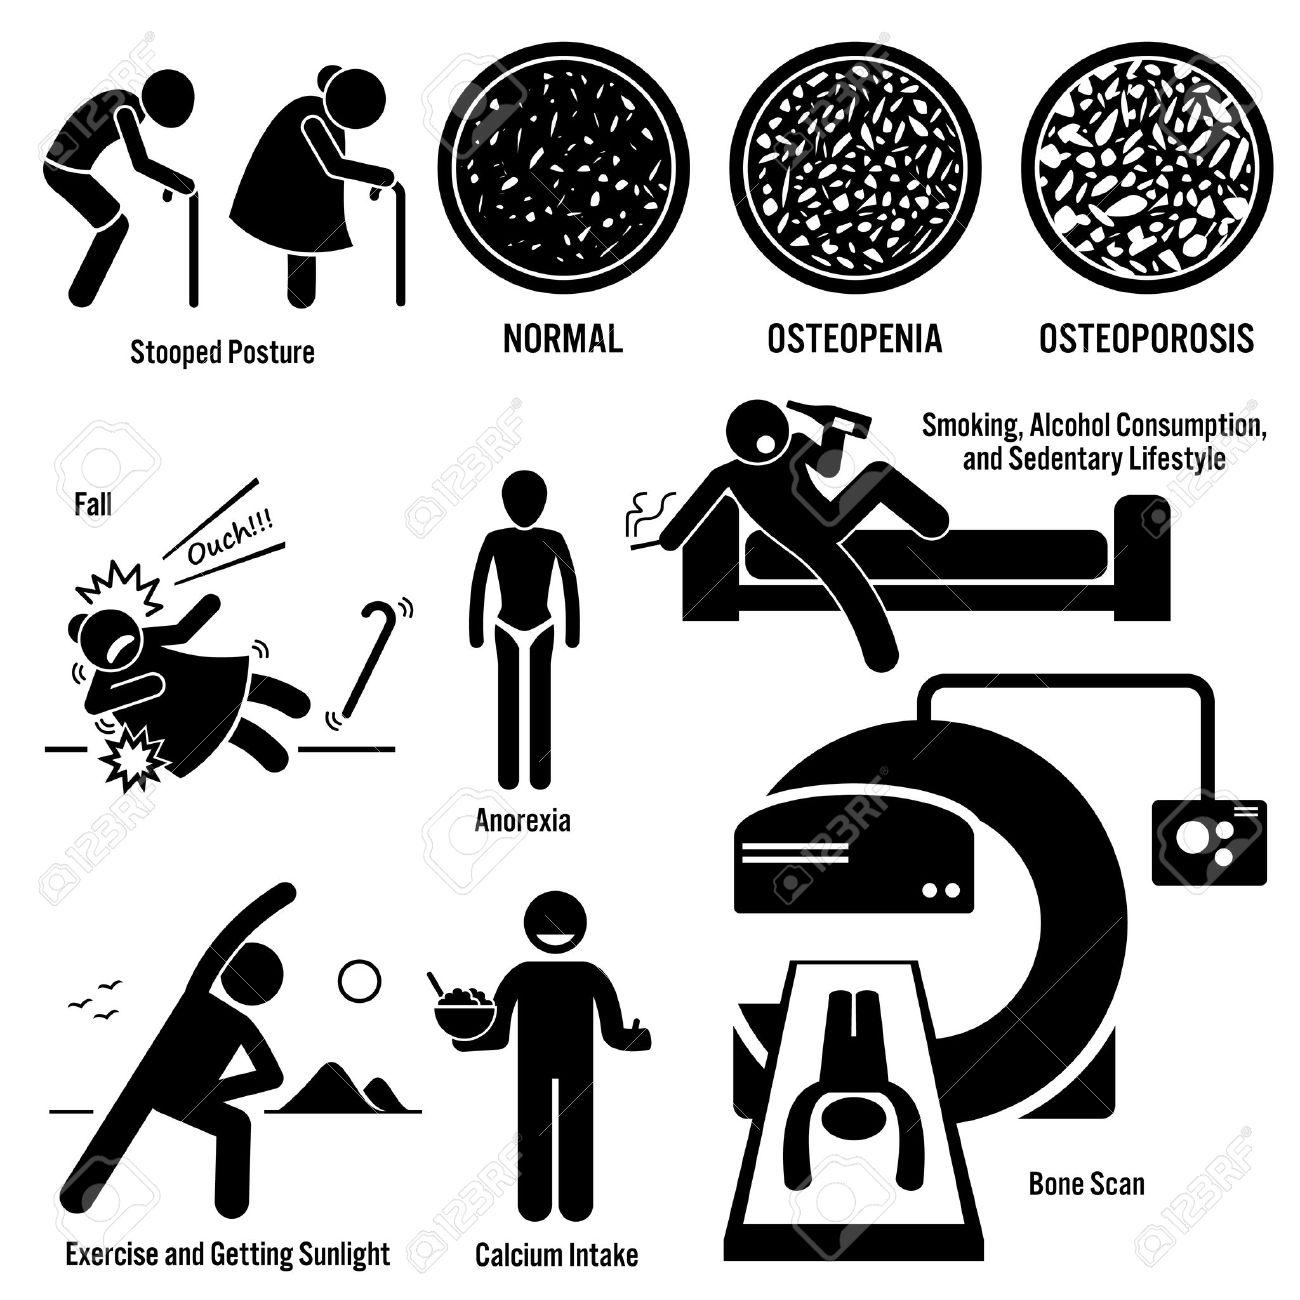 Osteoporosis Old Man Woman Symptoms Risk Factors Prevention Diagnosis Stick Figure Pictogram Icons - 51365350